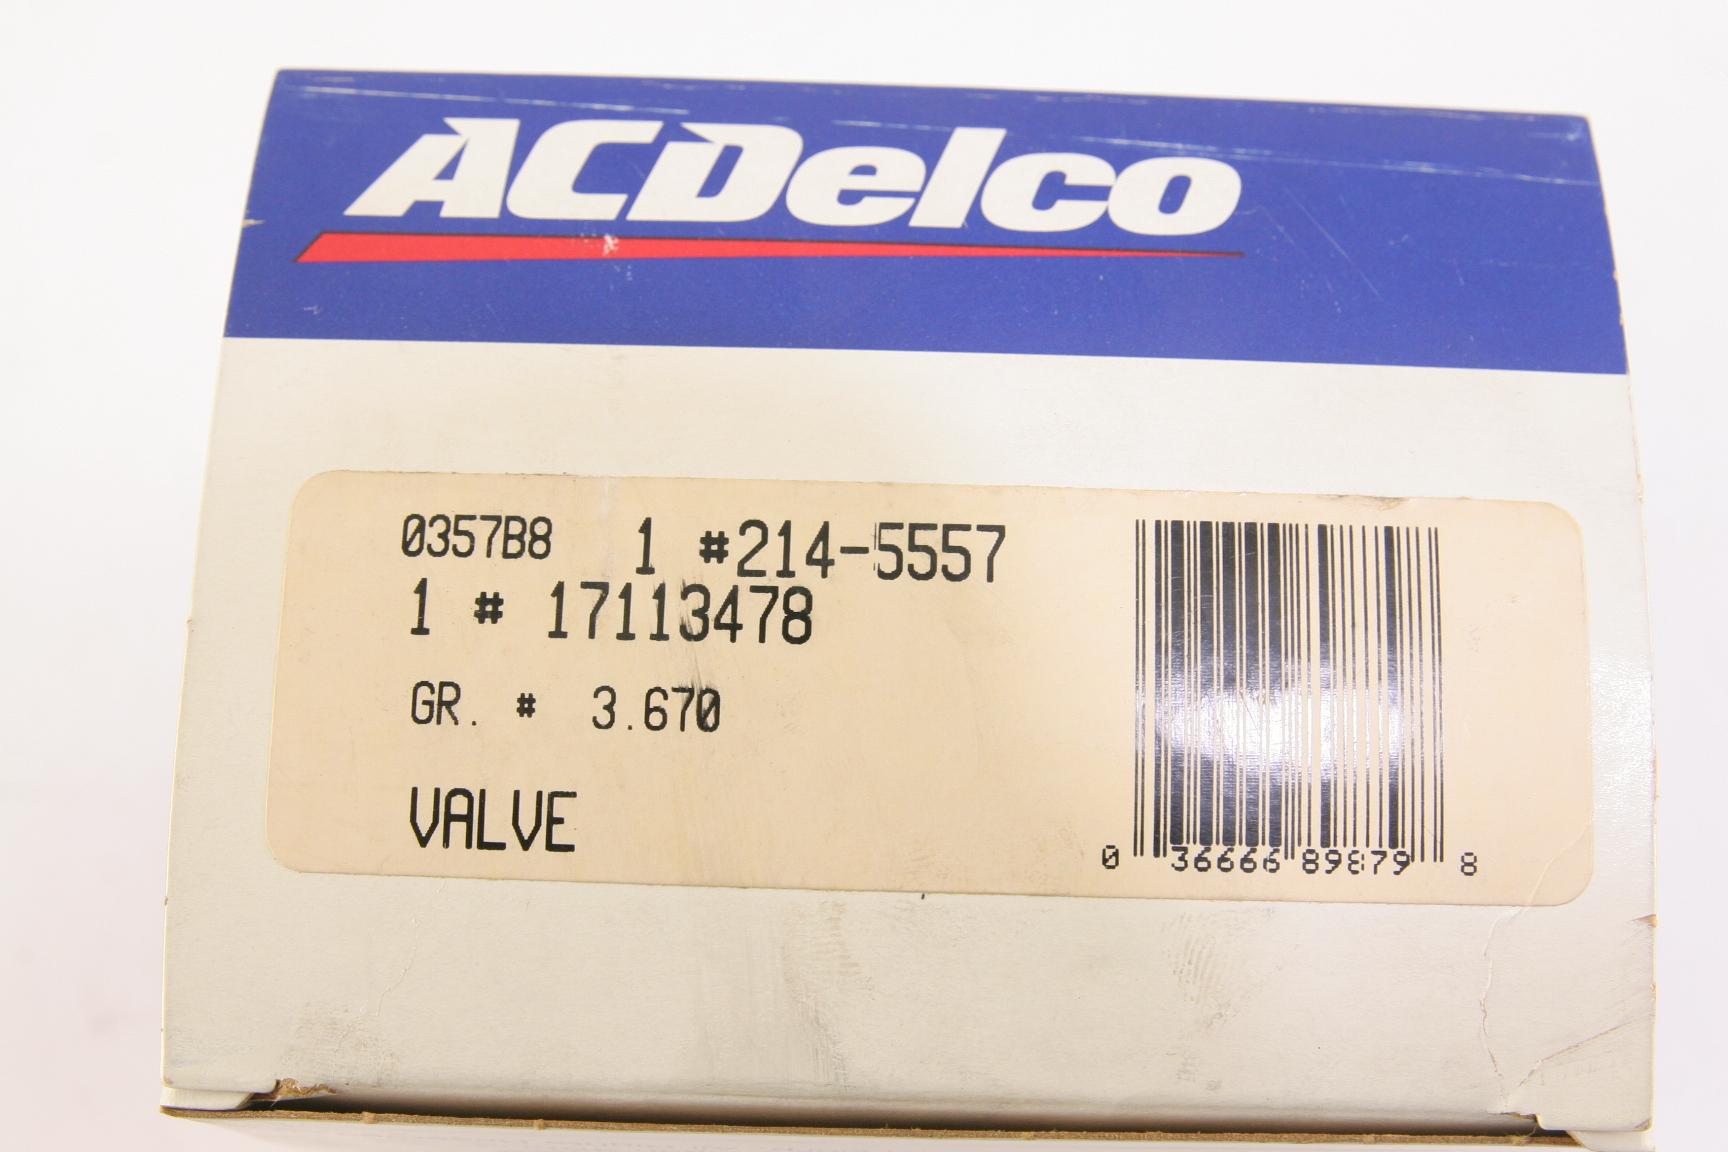 NEW ACDelco OEM 214-5557 EGR Valve 17113478 Free Shipping NIP - image 2